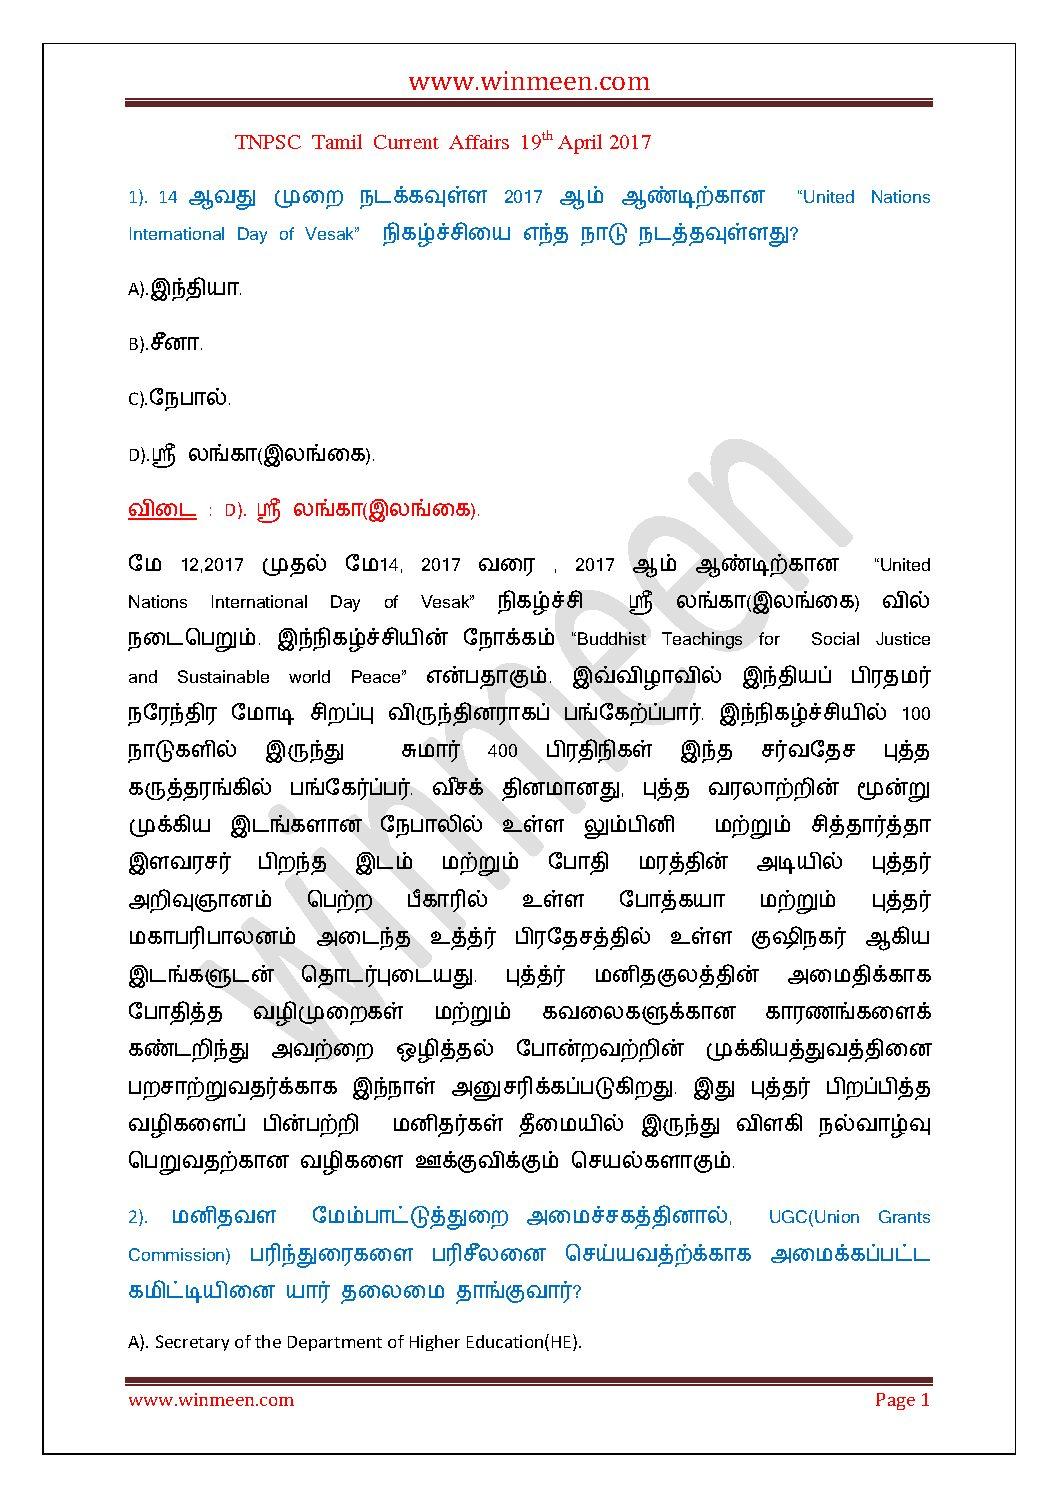 Tnpsc Tamil Current Affairs 19th April 2017 - WINMEEN